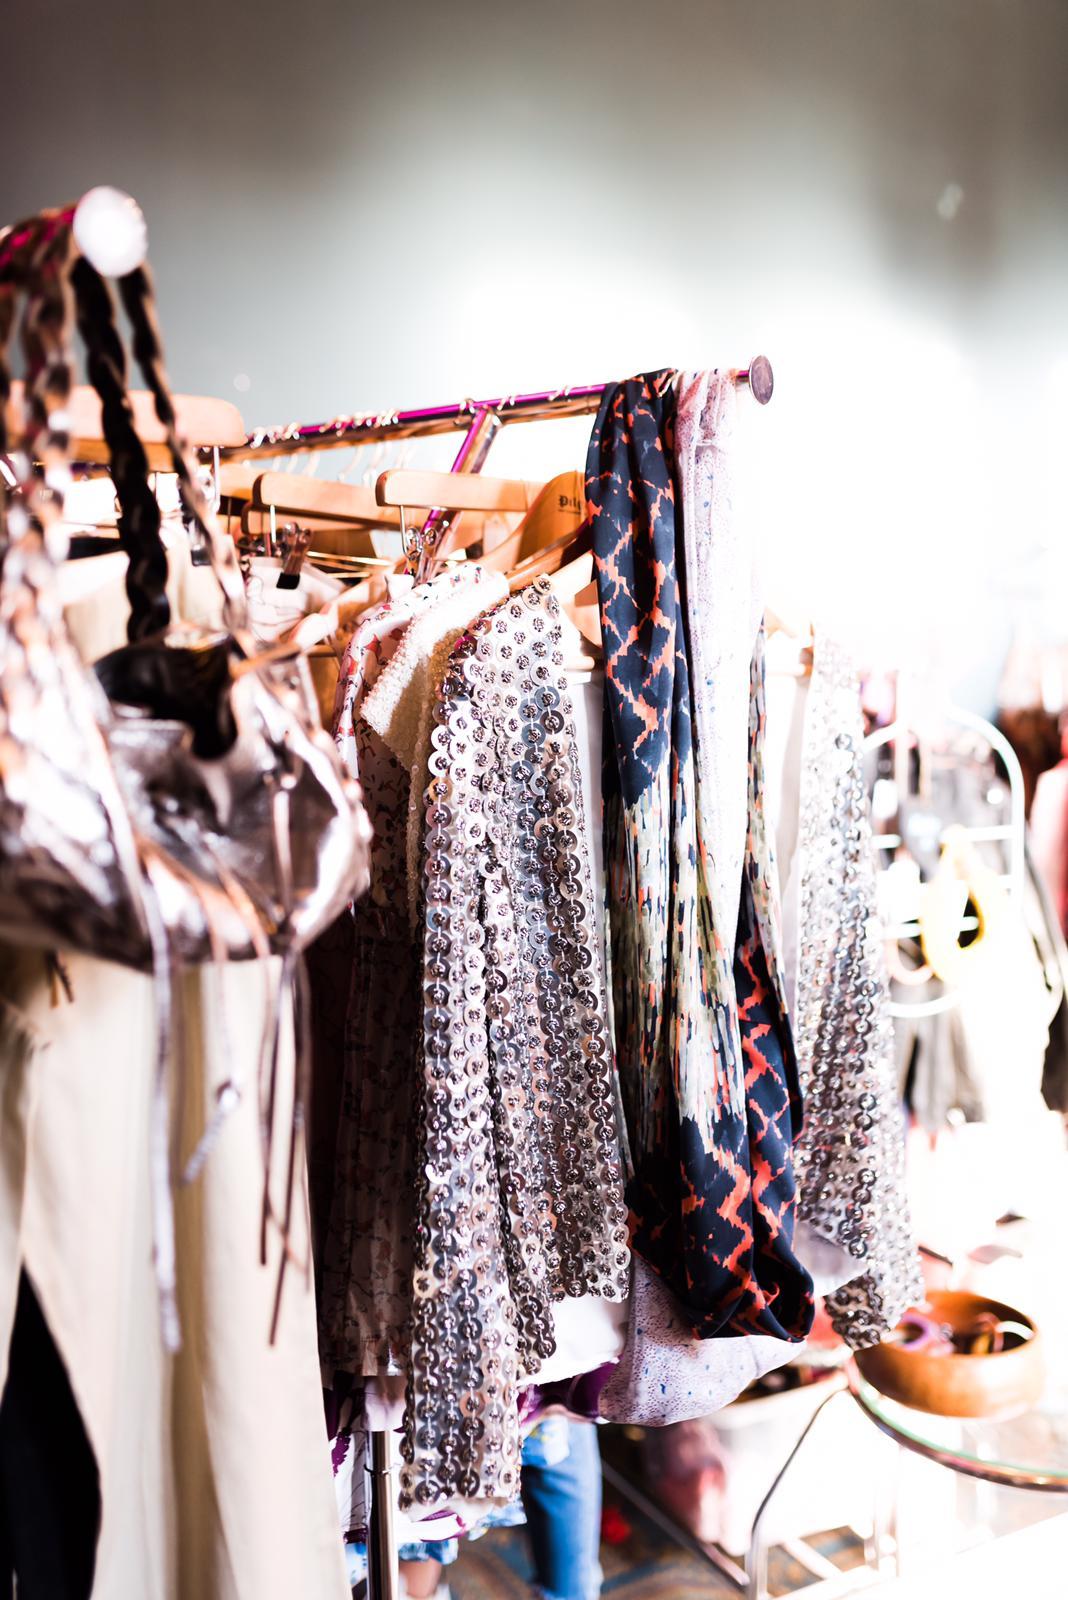 fashion-reboot-mums-the-word-event-tunbridge-wells-kent-support-local-magazine.JPG-9.JPG